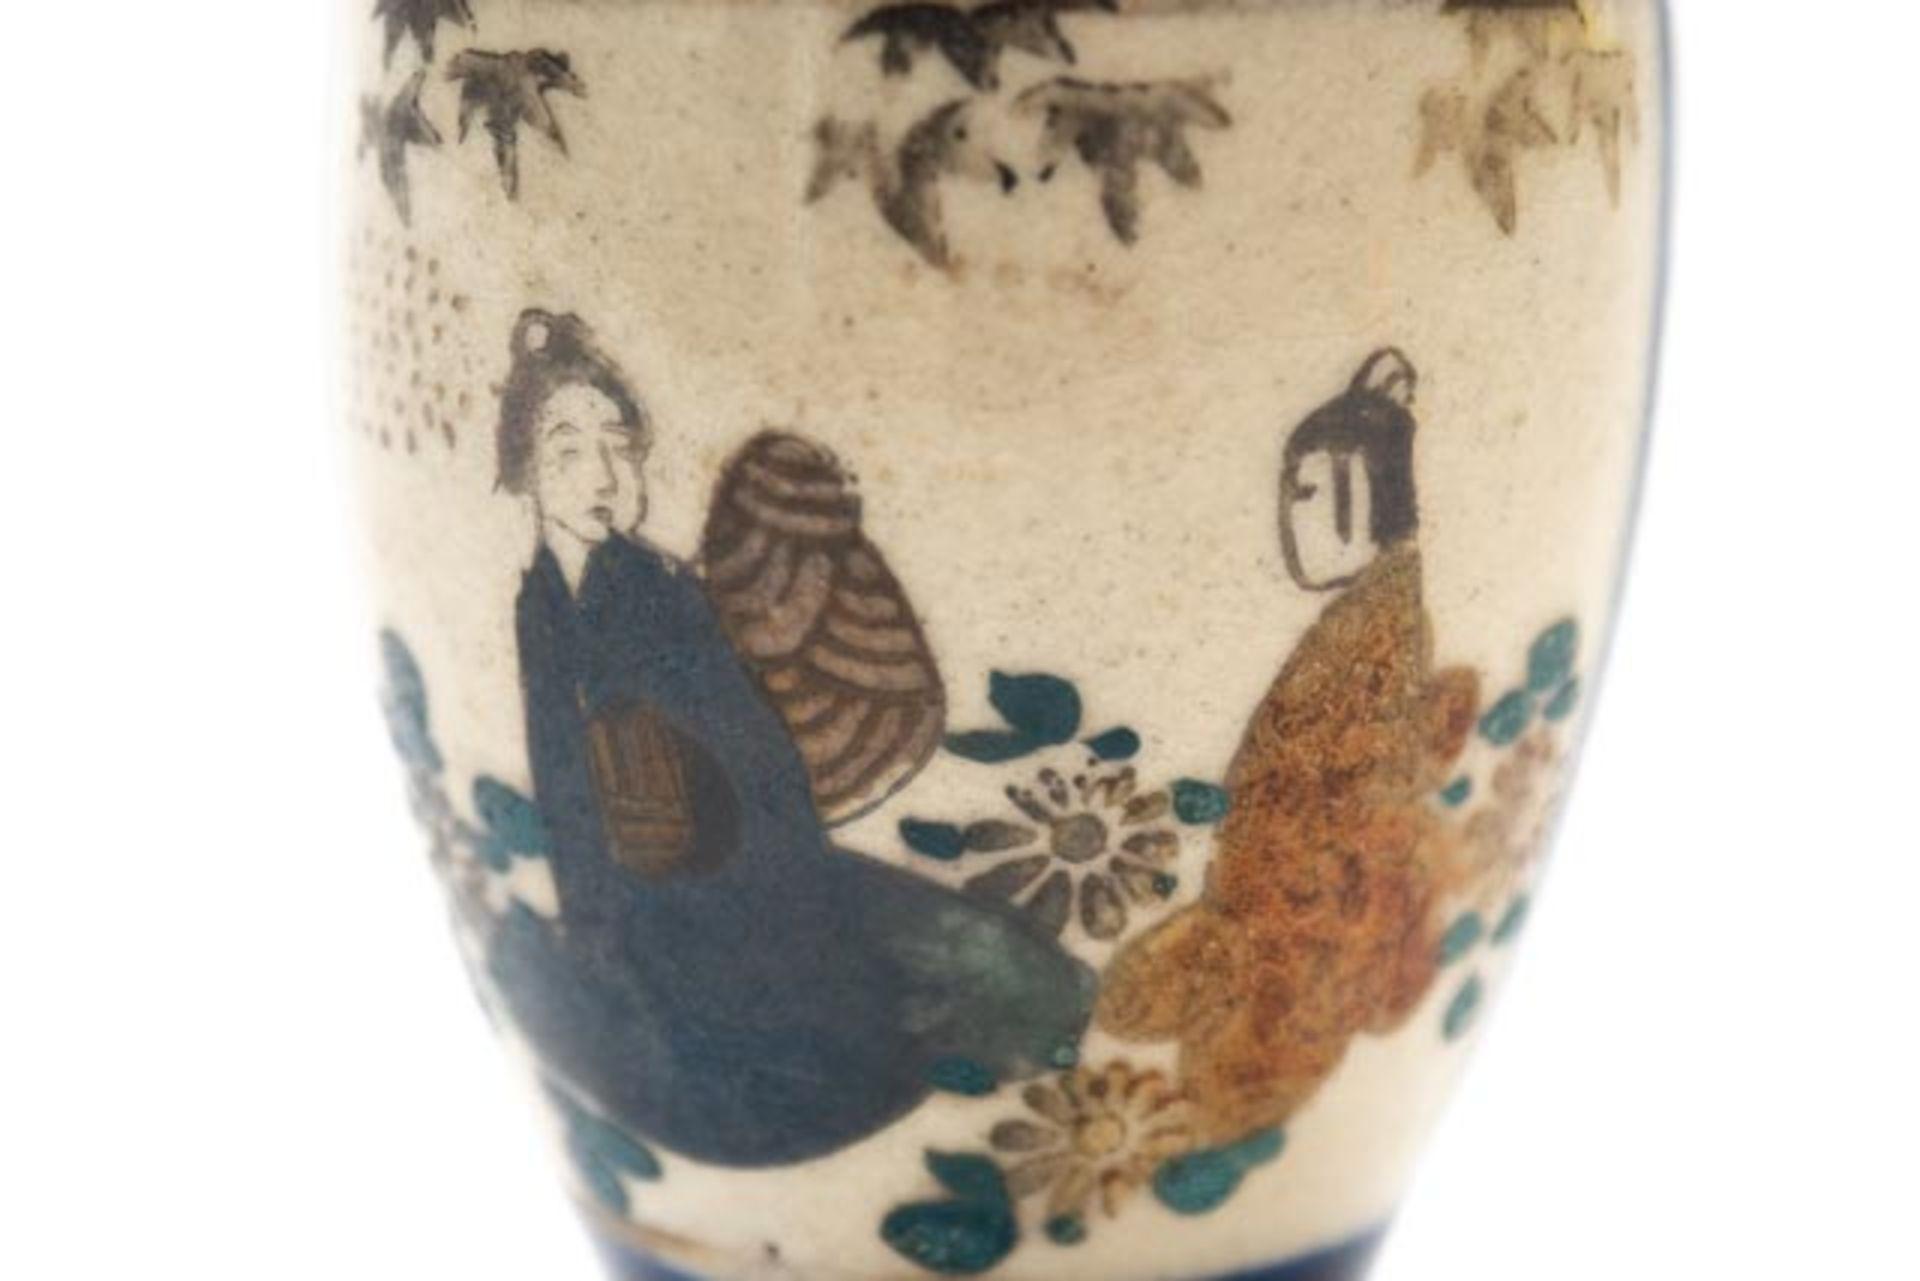 Chinesische Vase - Image 4 of 5